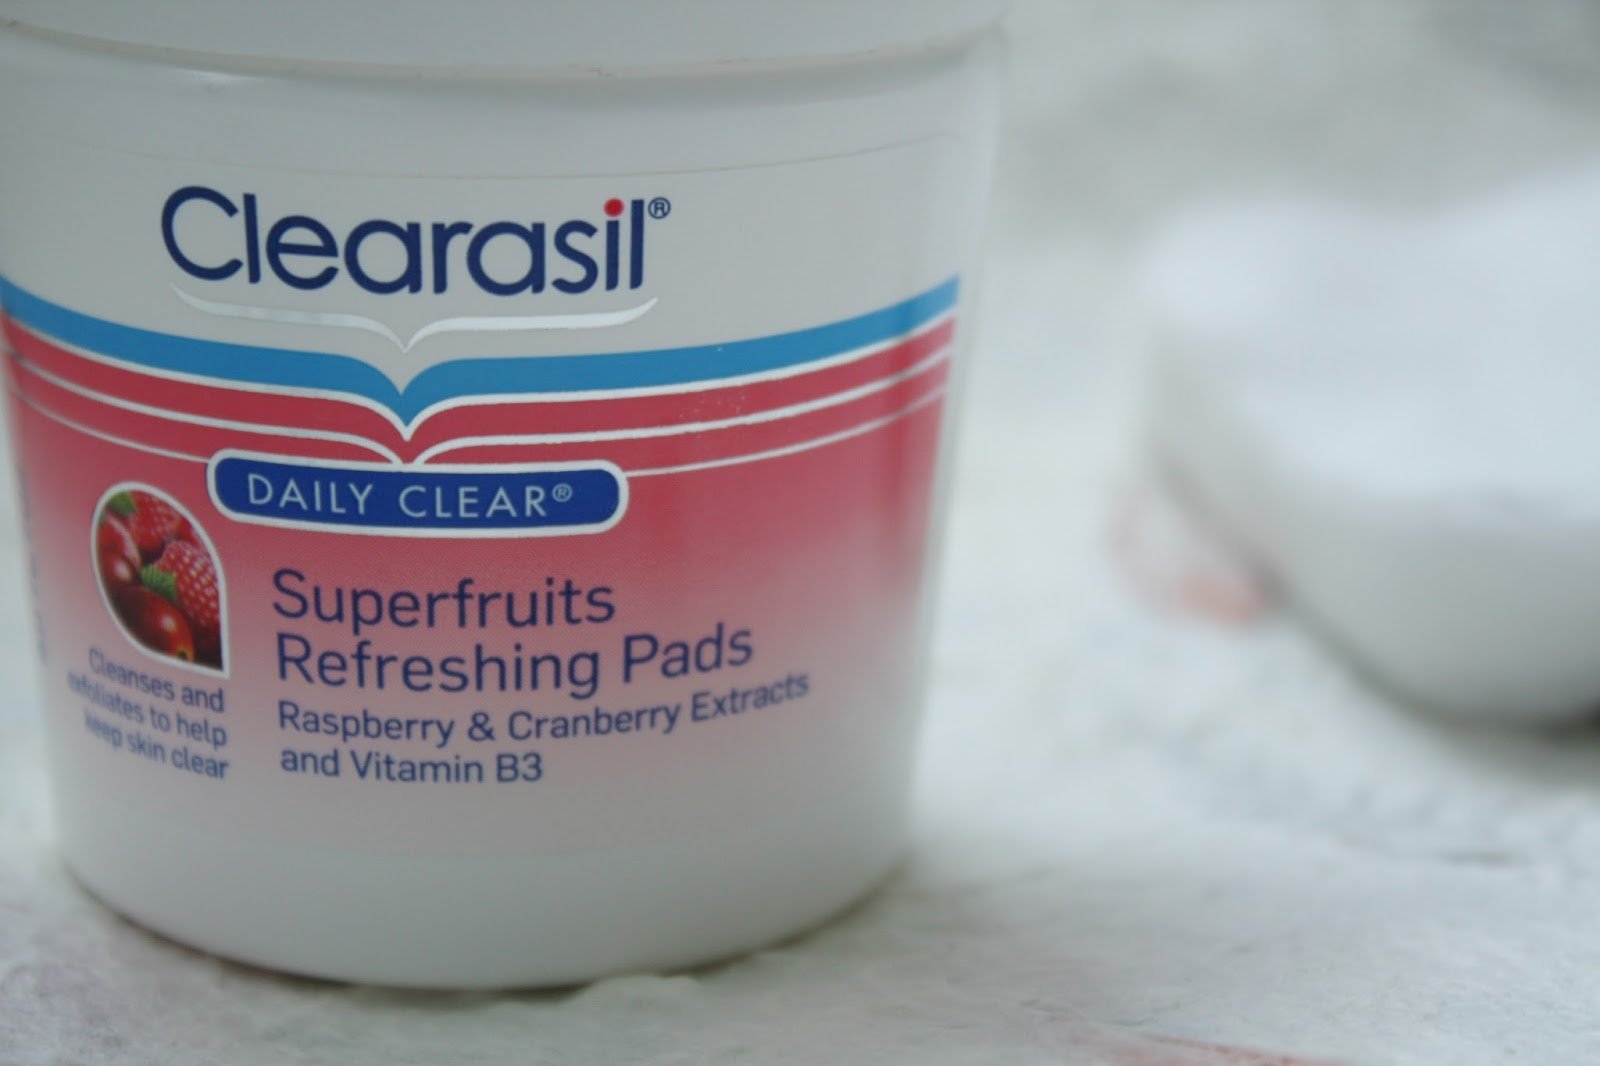 Clearasil Superfruits Refreshing Pads